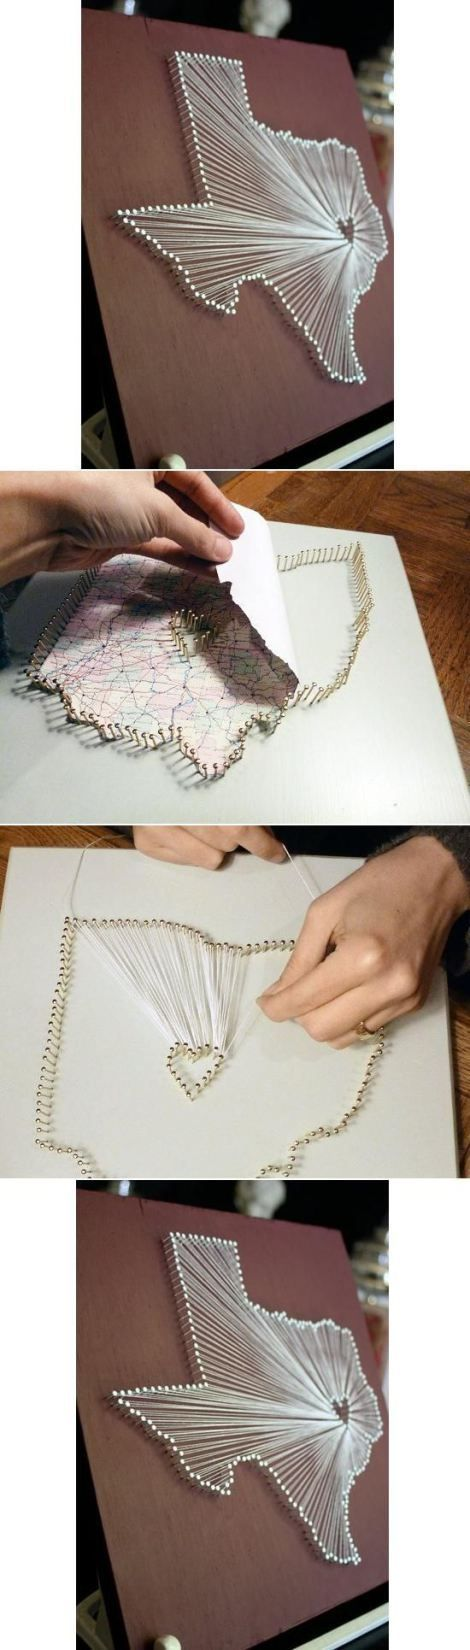 Strapless Floor Length Attached Alencon Lace/ Charmeuse Lace Wedding Dress  #necklace #Bracelets #Fashion